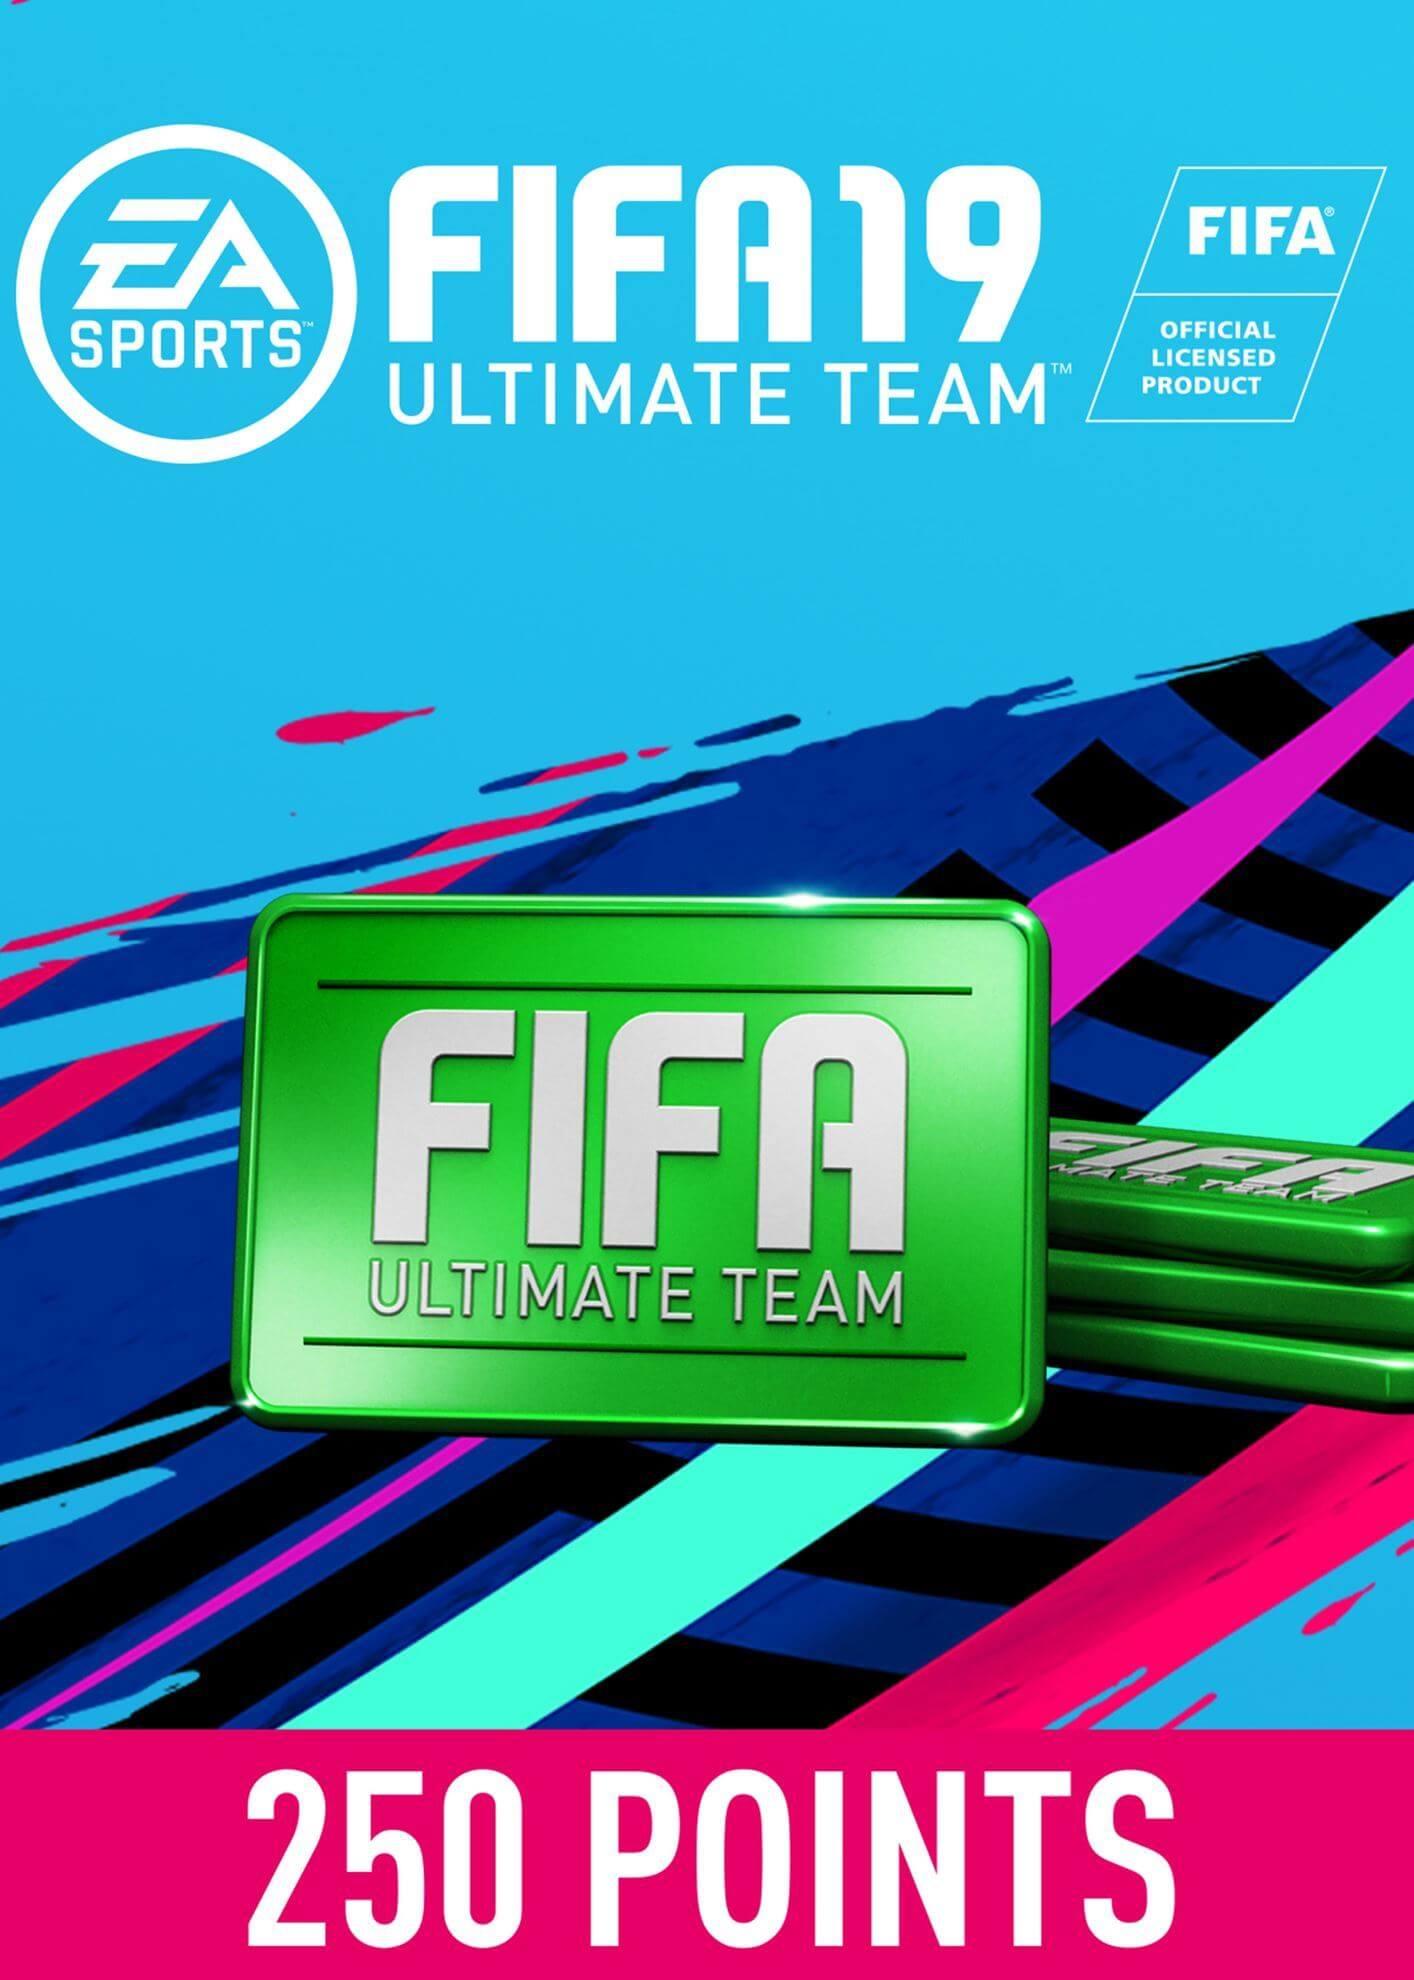 FIFA 19 ULTIMATE TEAM FIFA POINTS 250